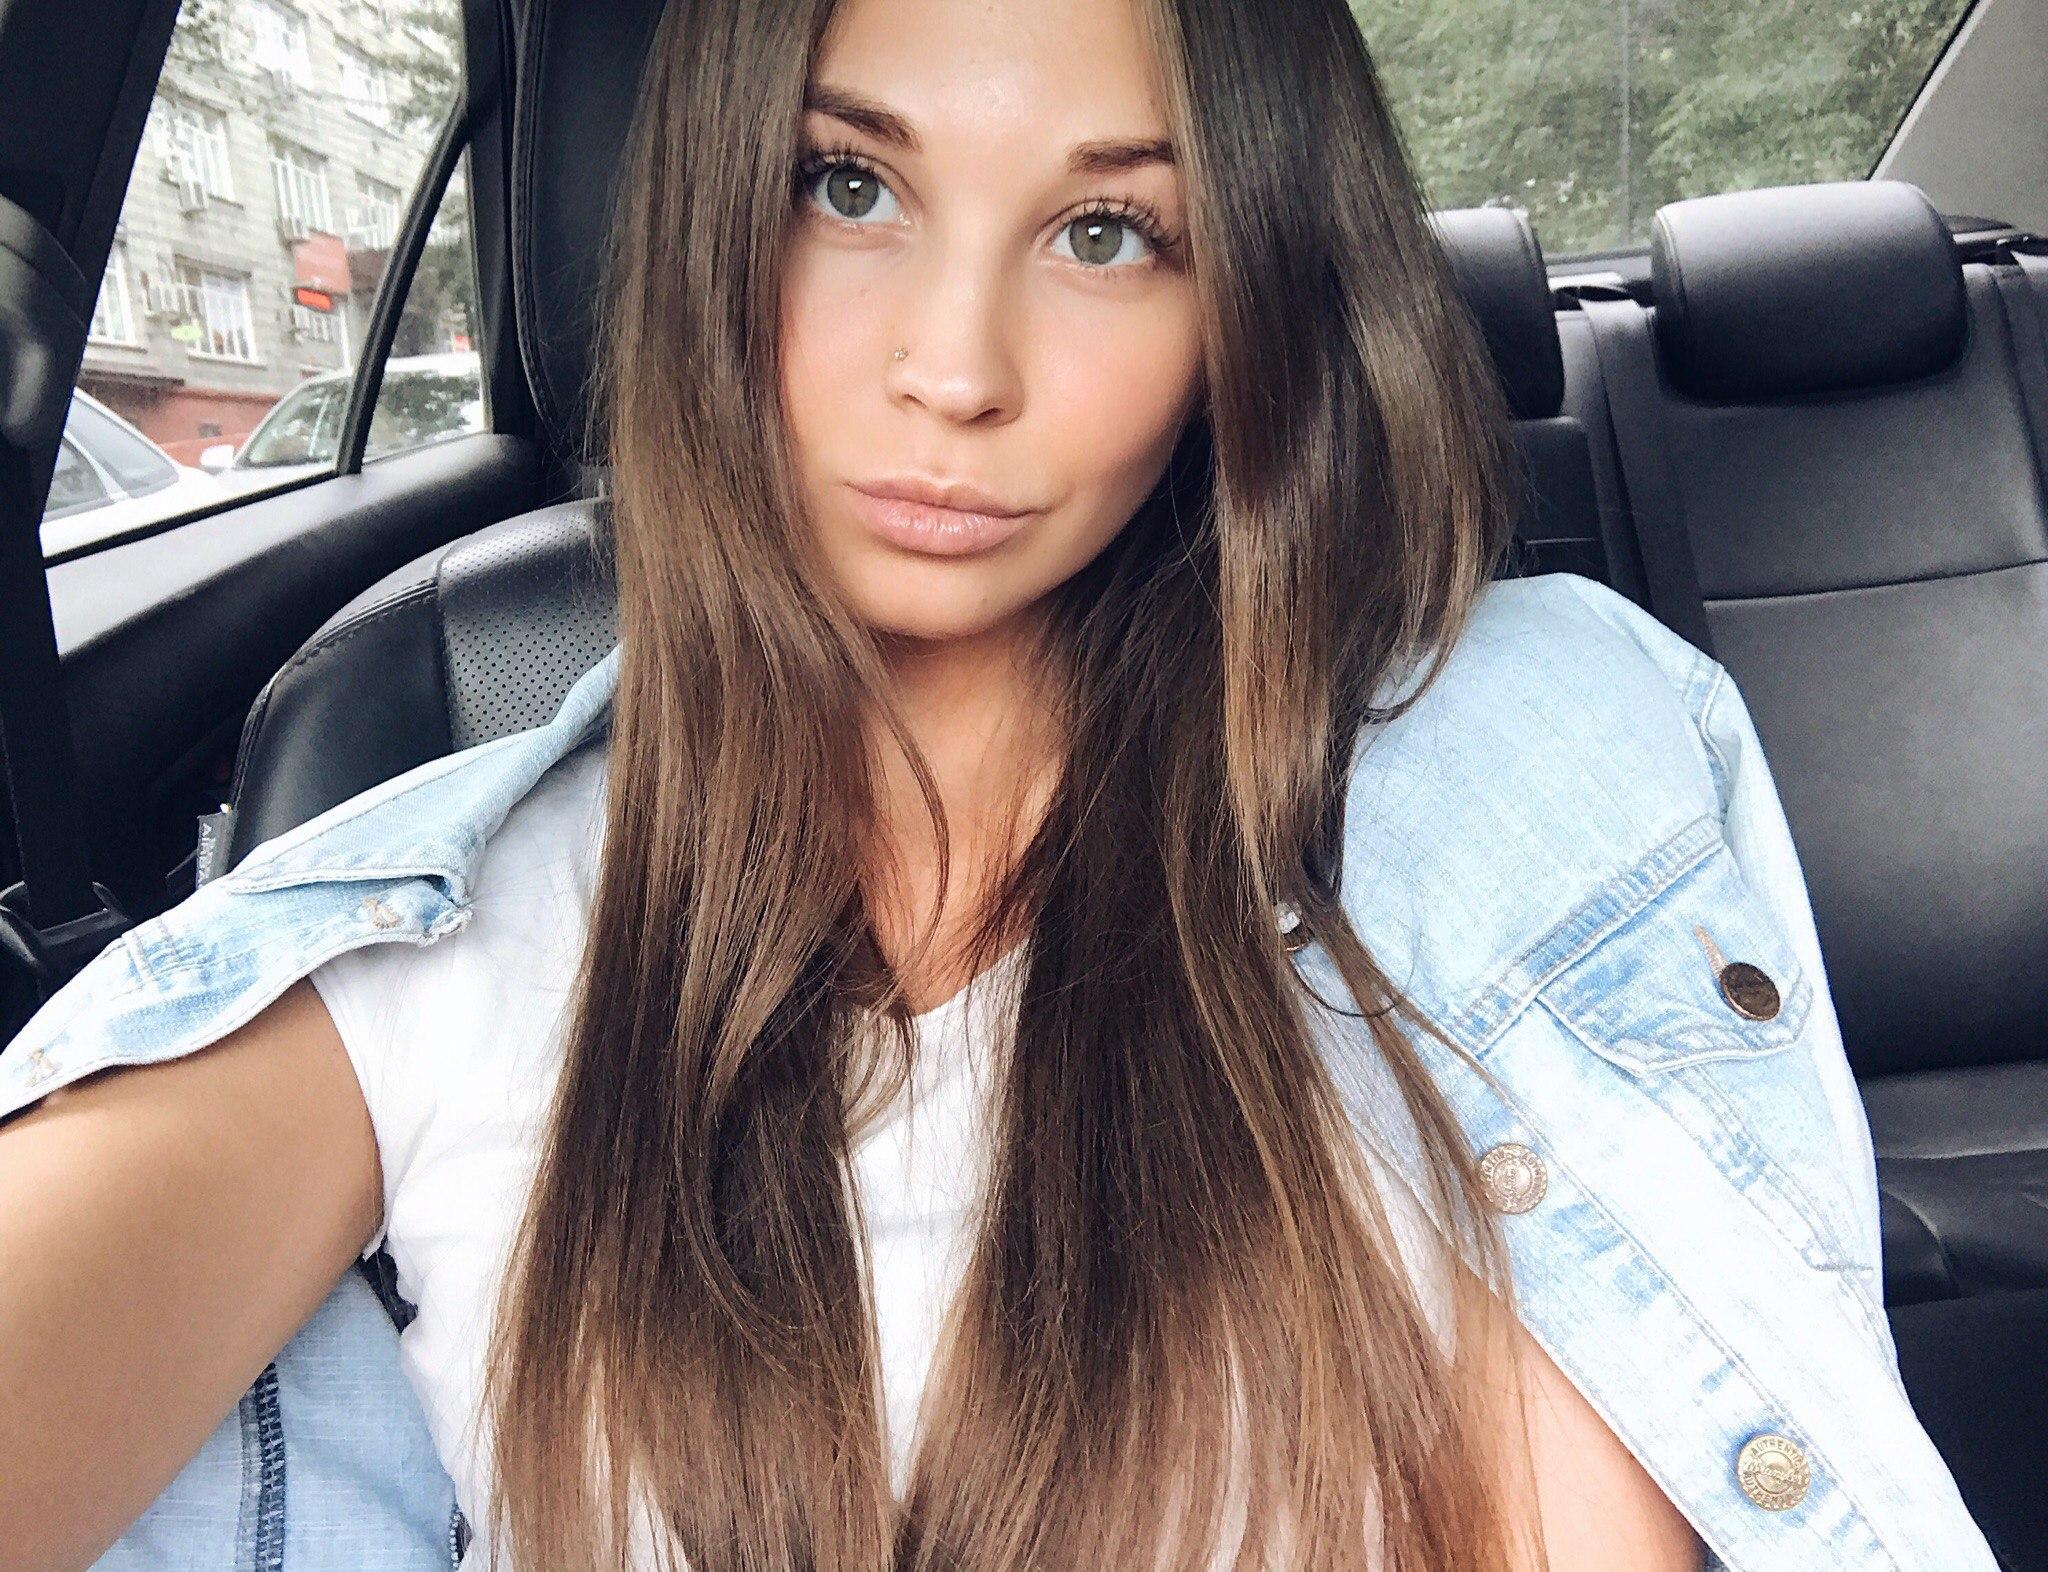 На борту разбившегося Ан-148 летела девушка из Новосибирска